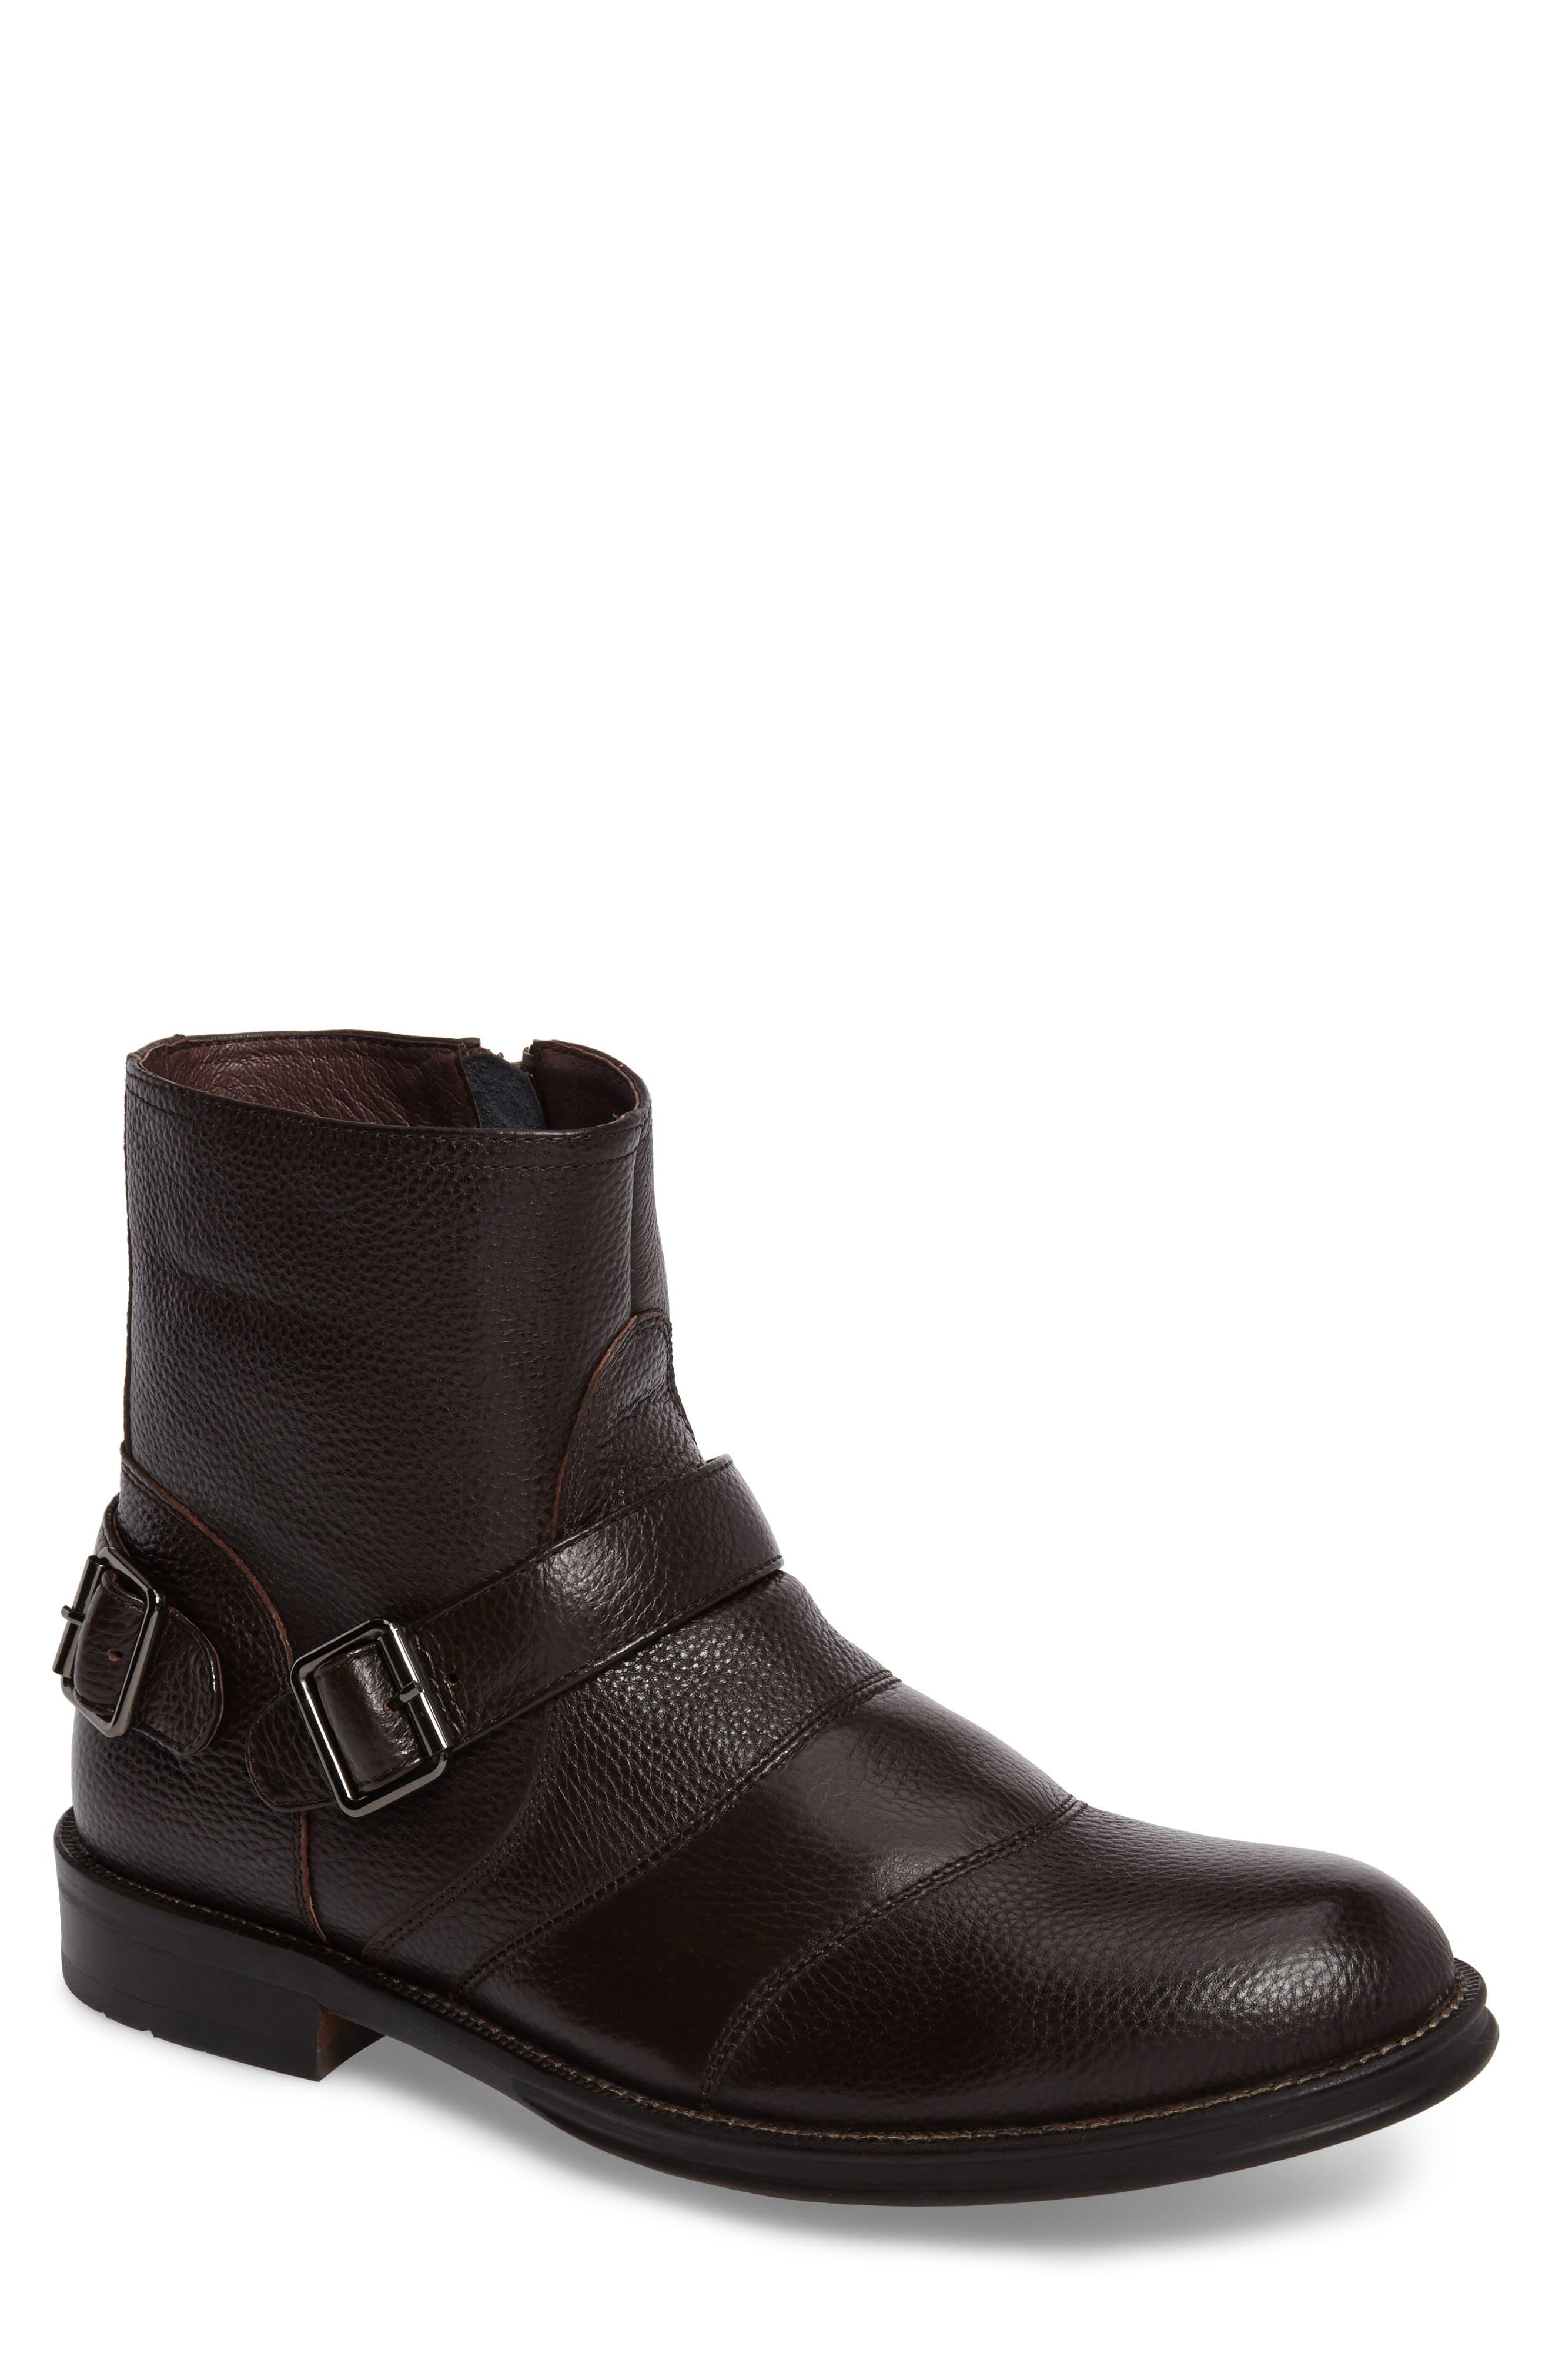 Zanzara Howson Buckle Strap Boot (Men)